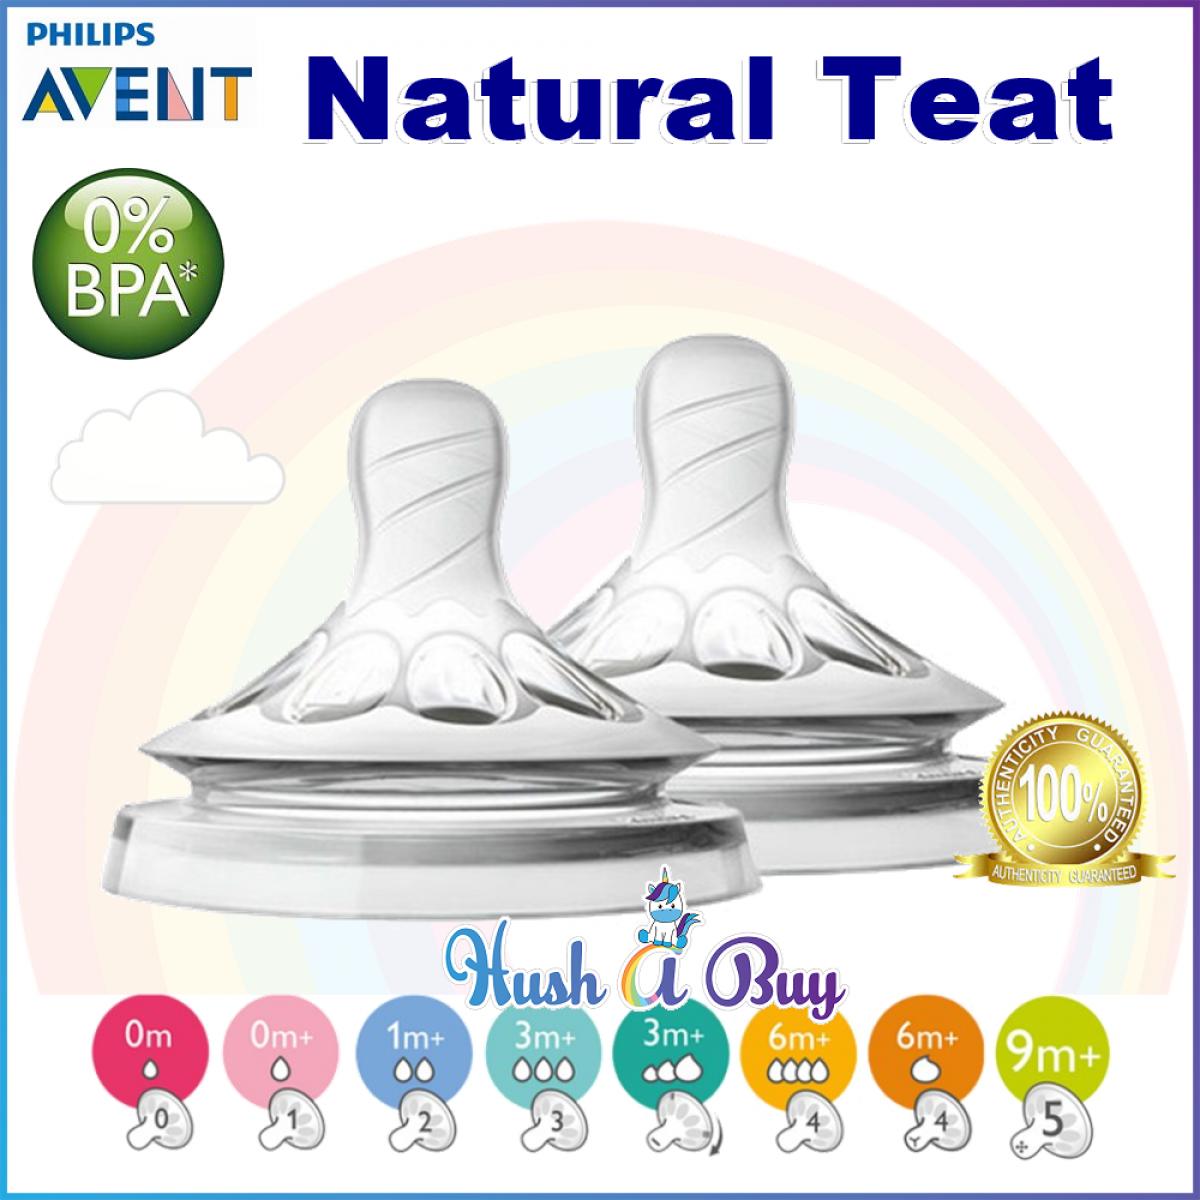 Philips Avent Natural Teats 2pcs / Buting / Nipple / 1m / 3M /6M / Variable Flow / Y Cut